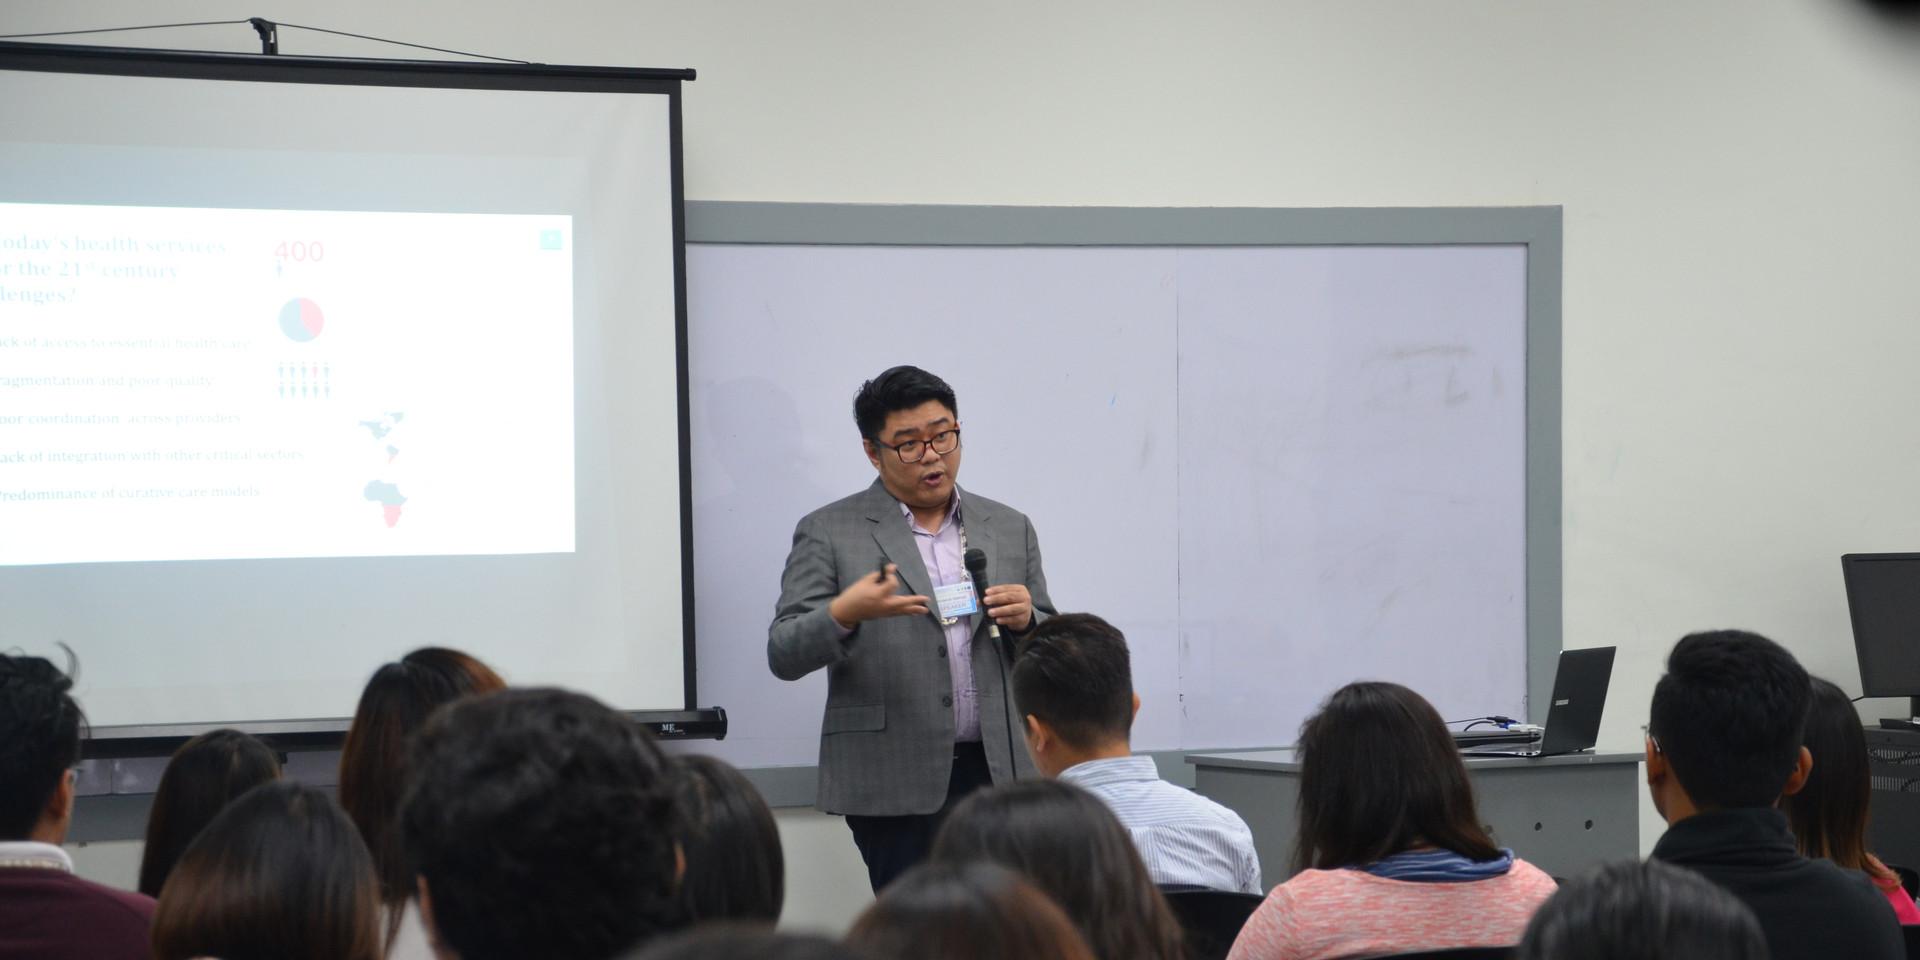 Eric Salenga (Keynote Speech)